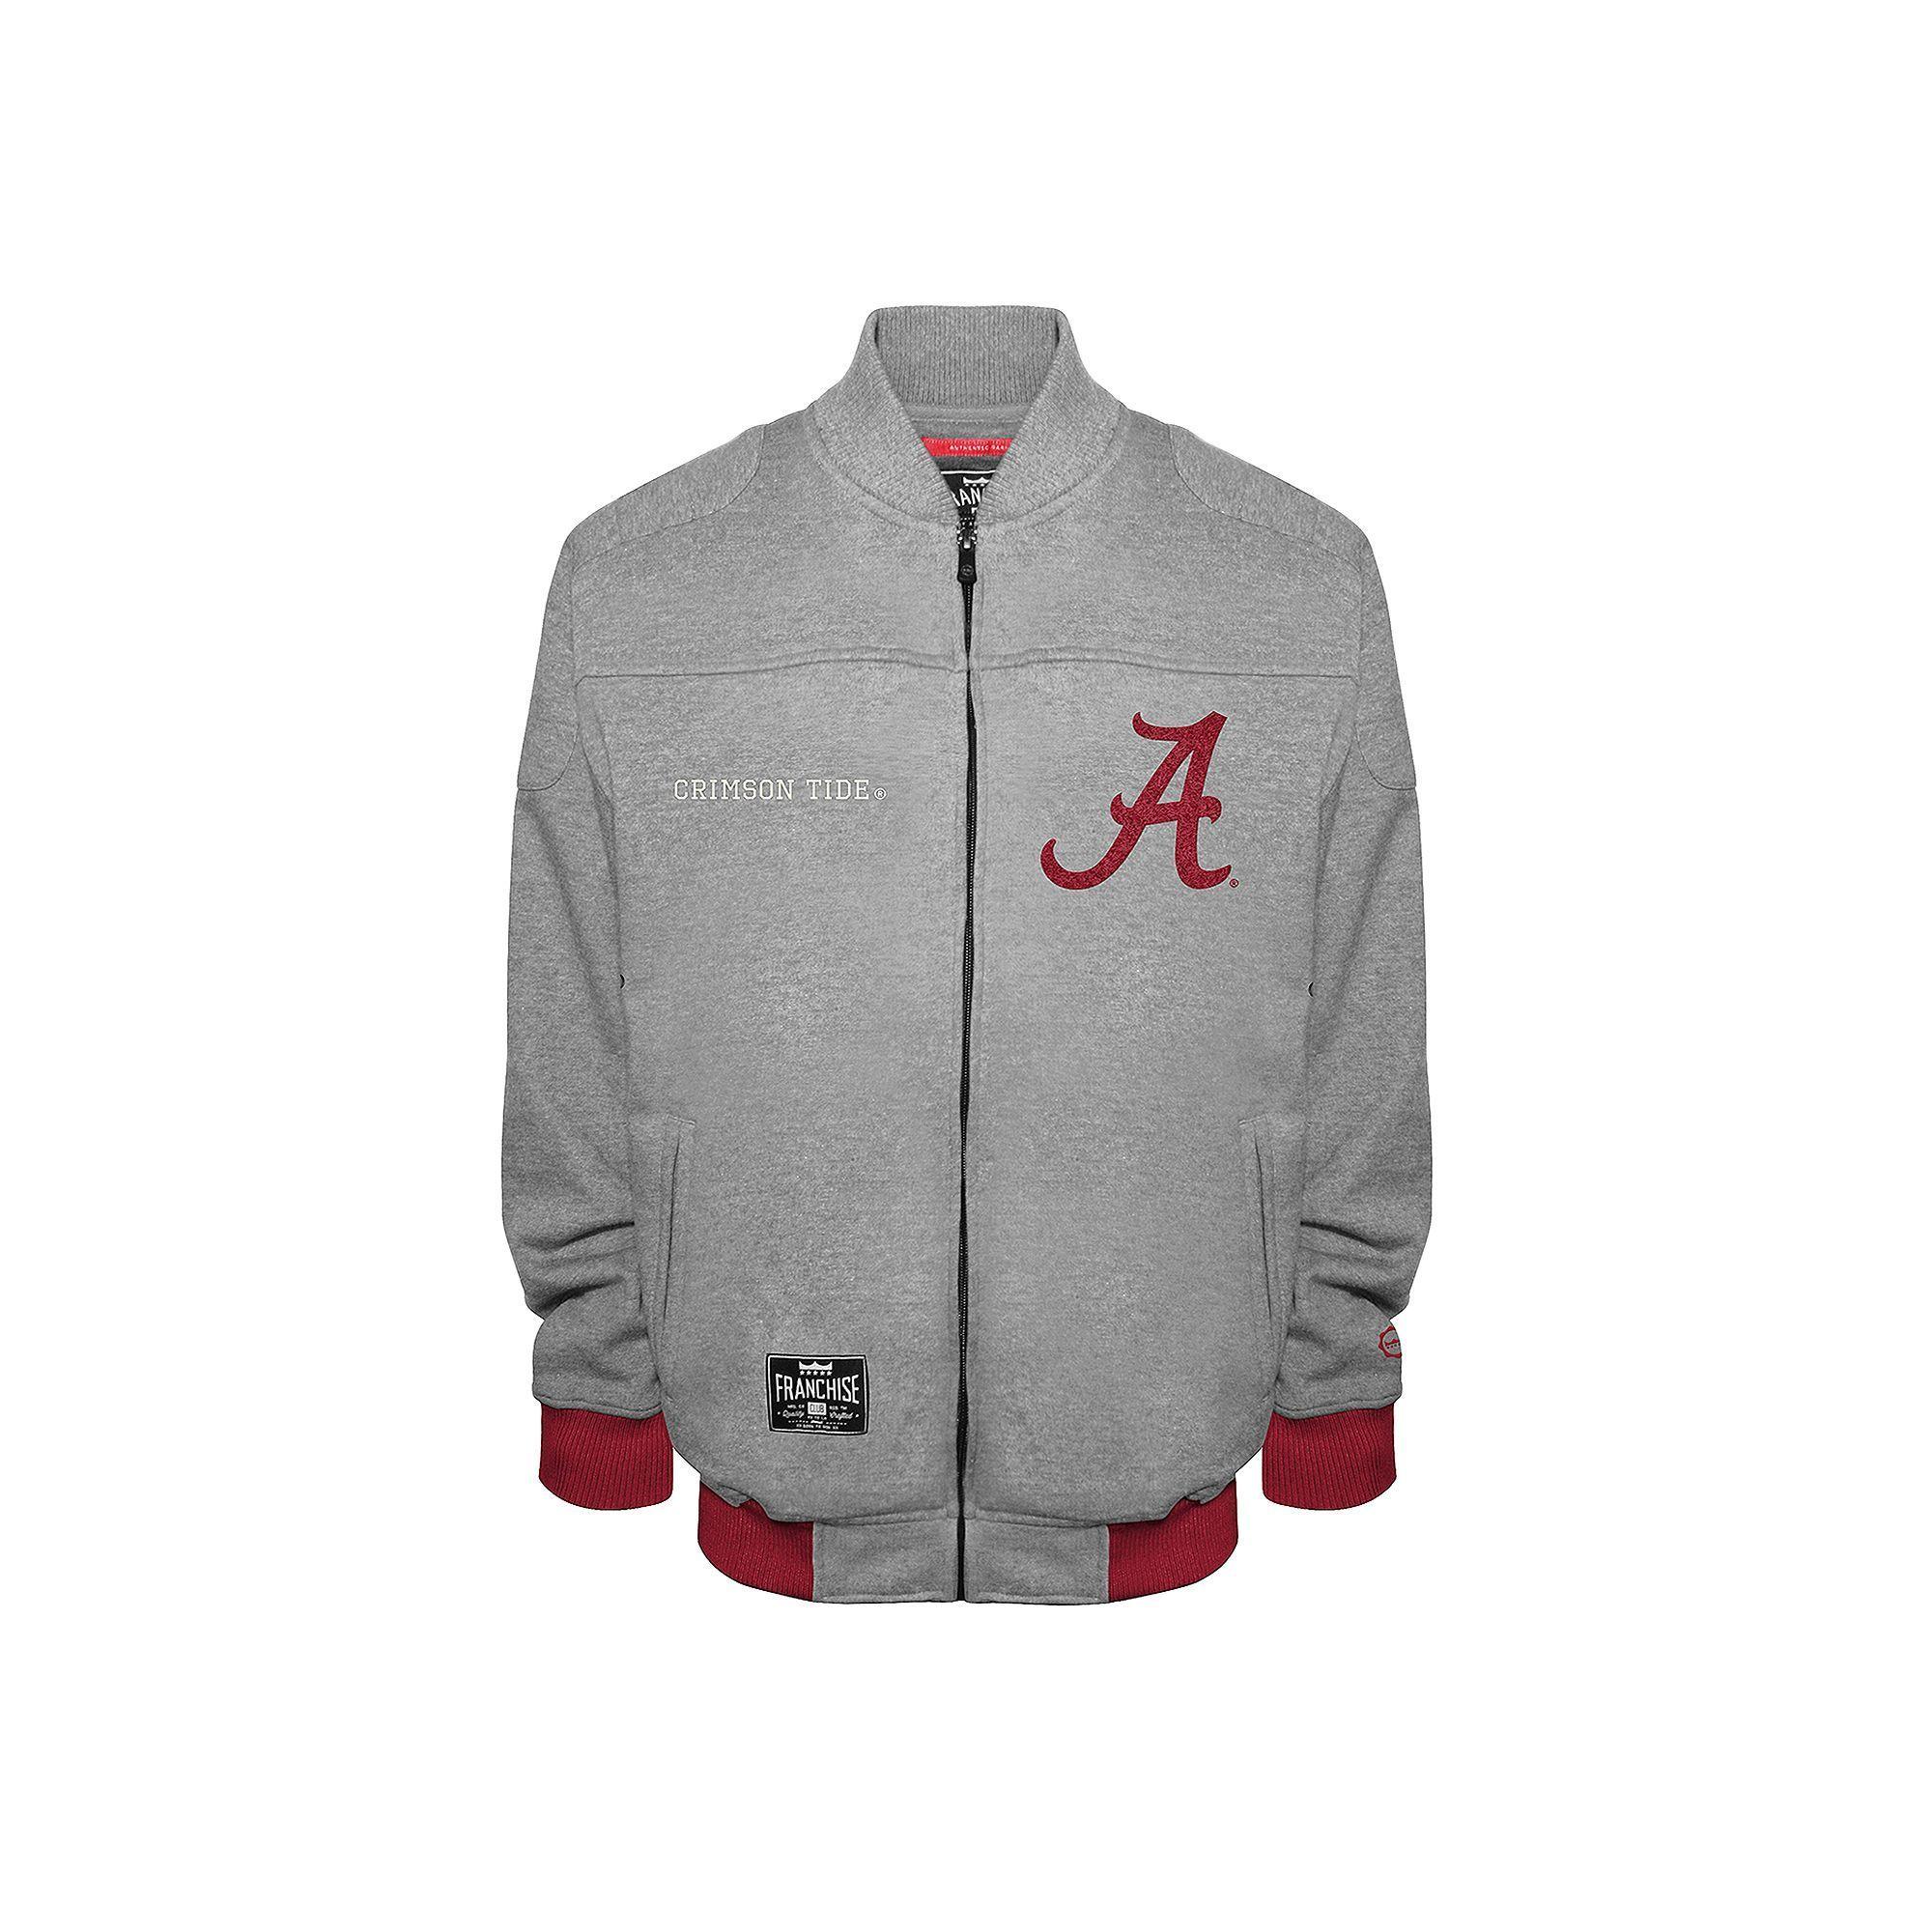 d2e7215a2 Men's Franchise Club Alabama Crimson Tide Edge Fleece Jacket, Size ...